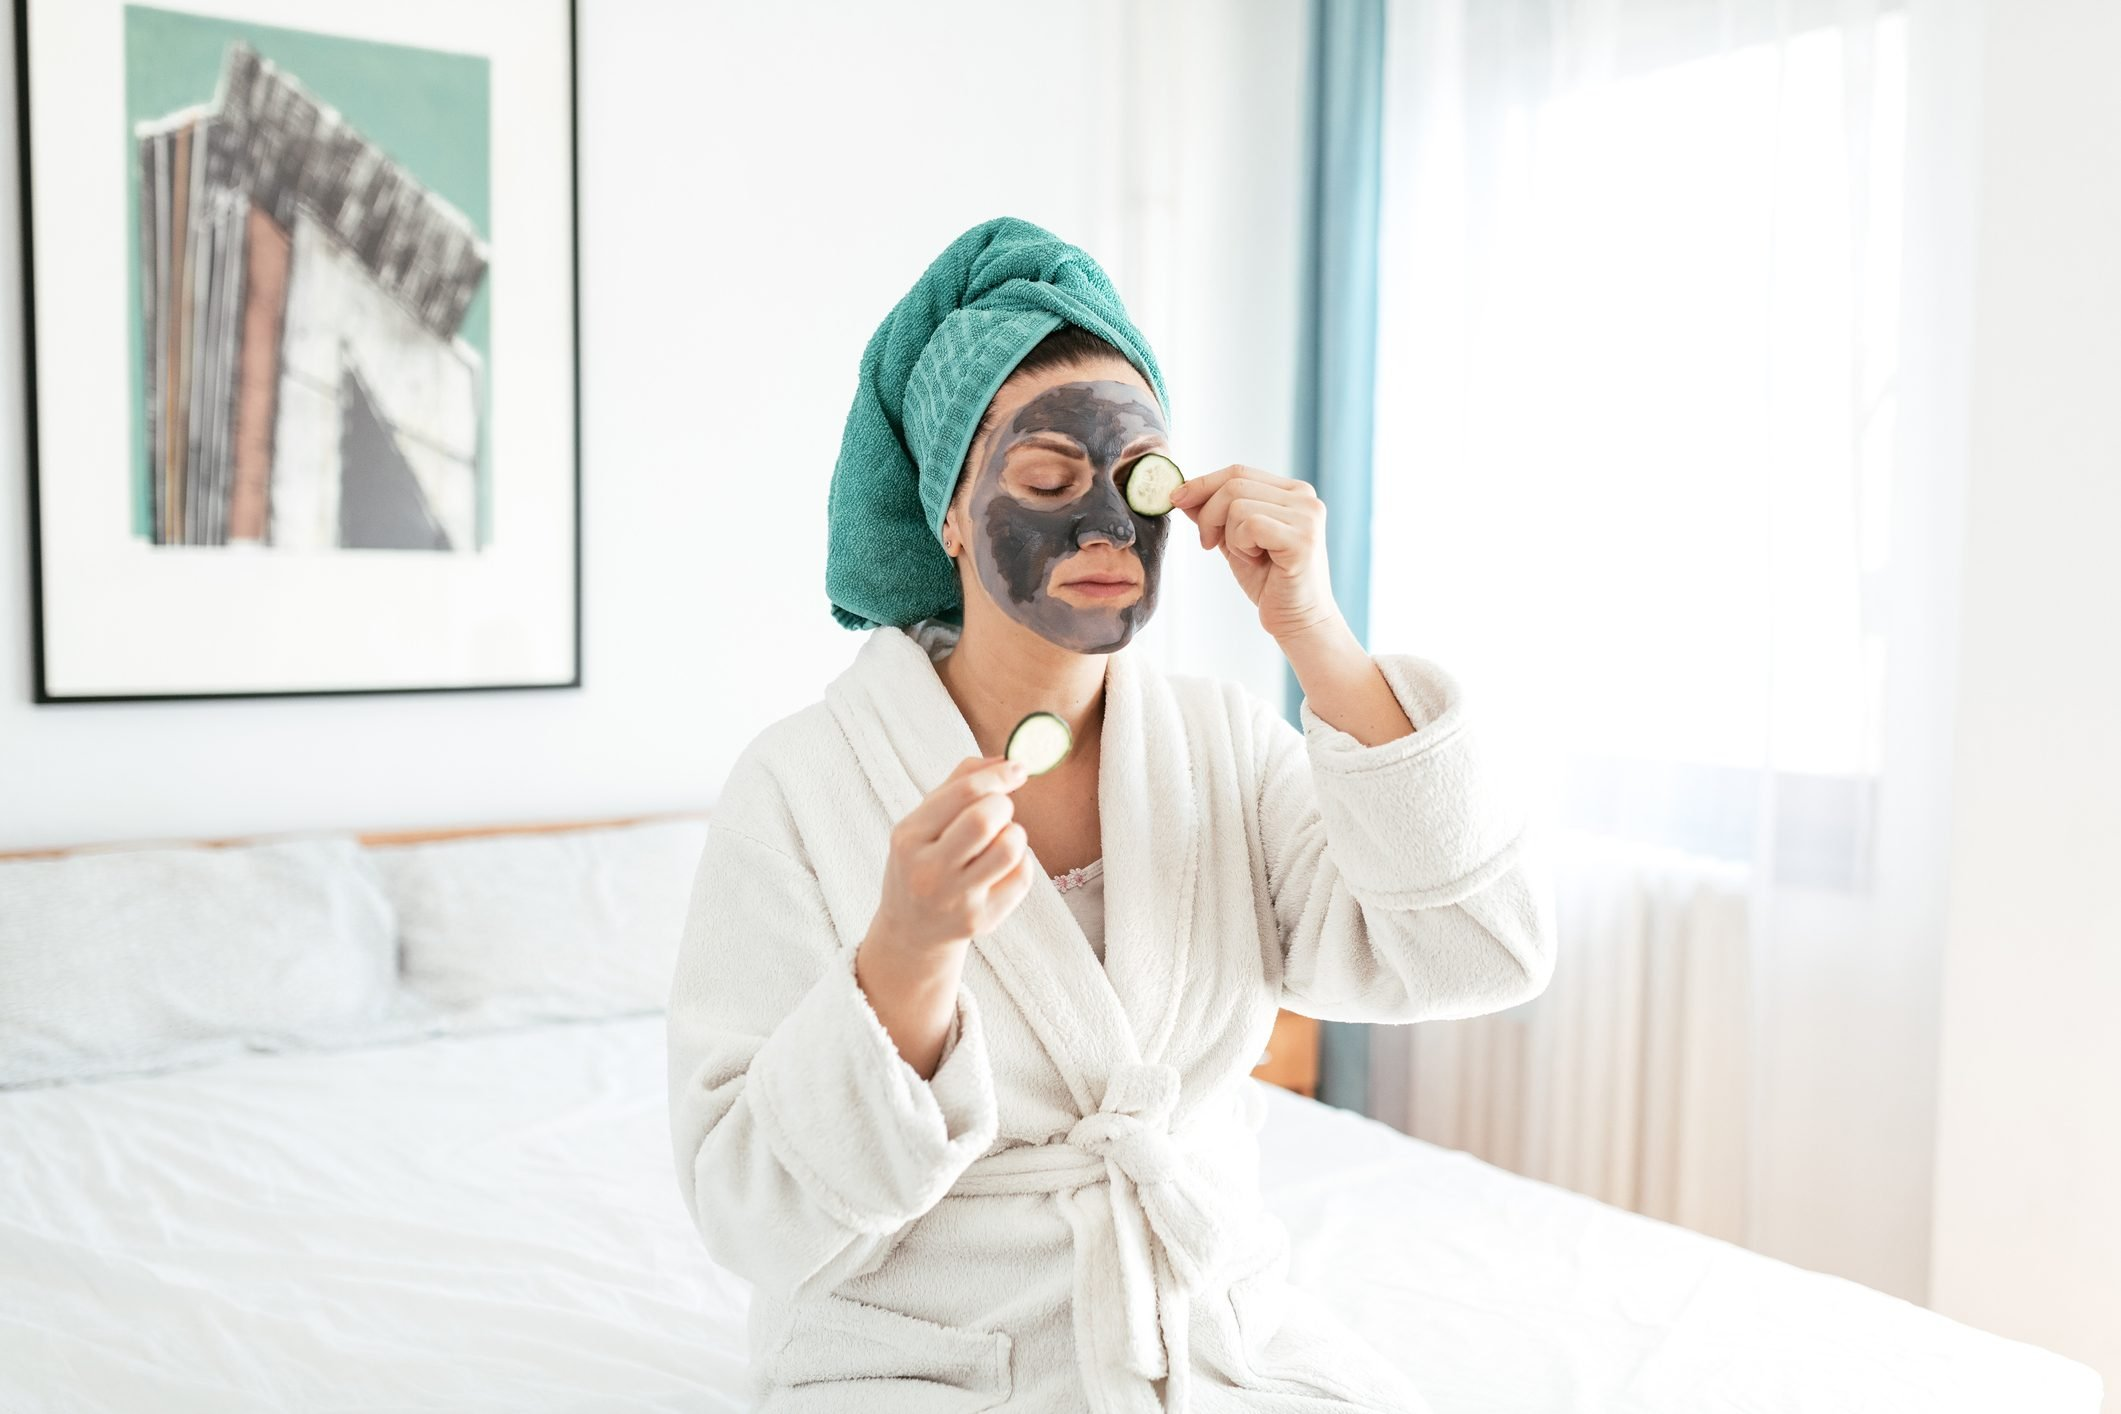 Woman enjoys beauty treatment at home spa